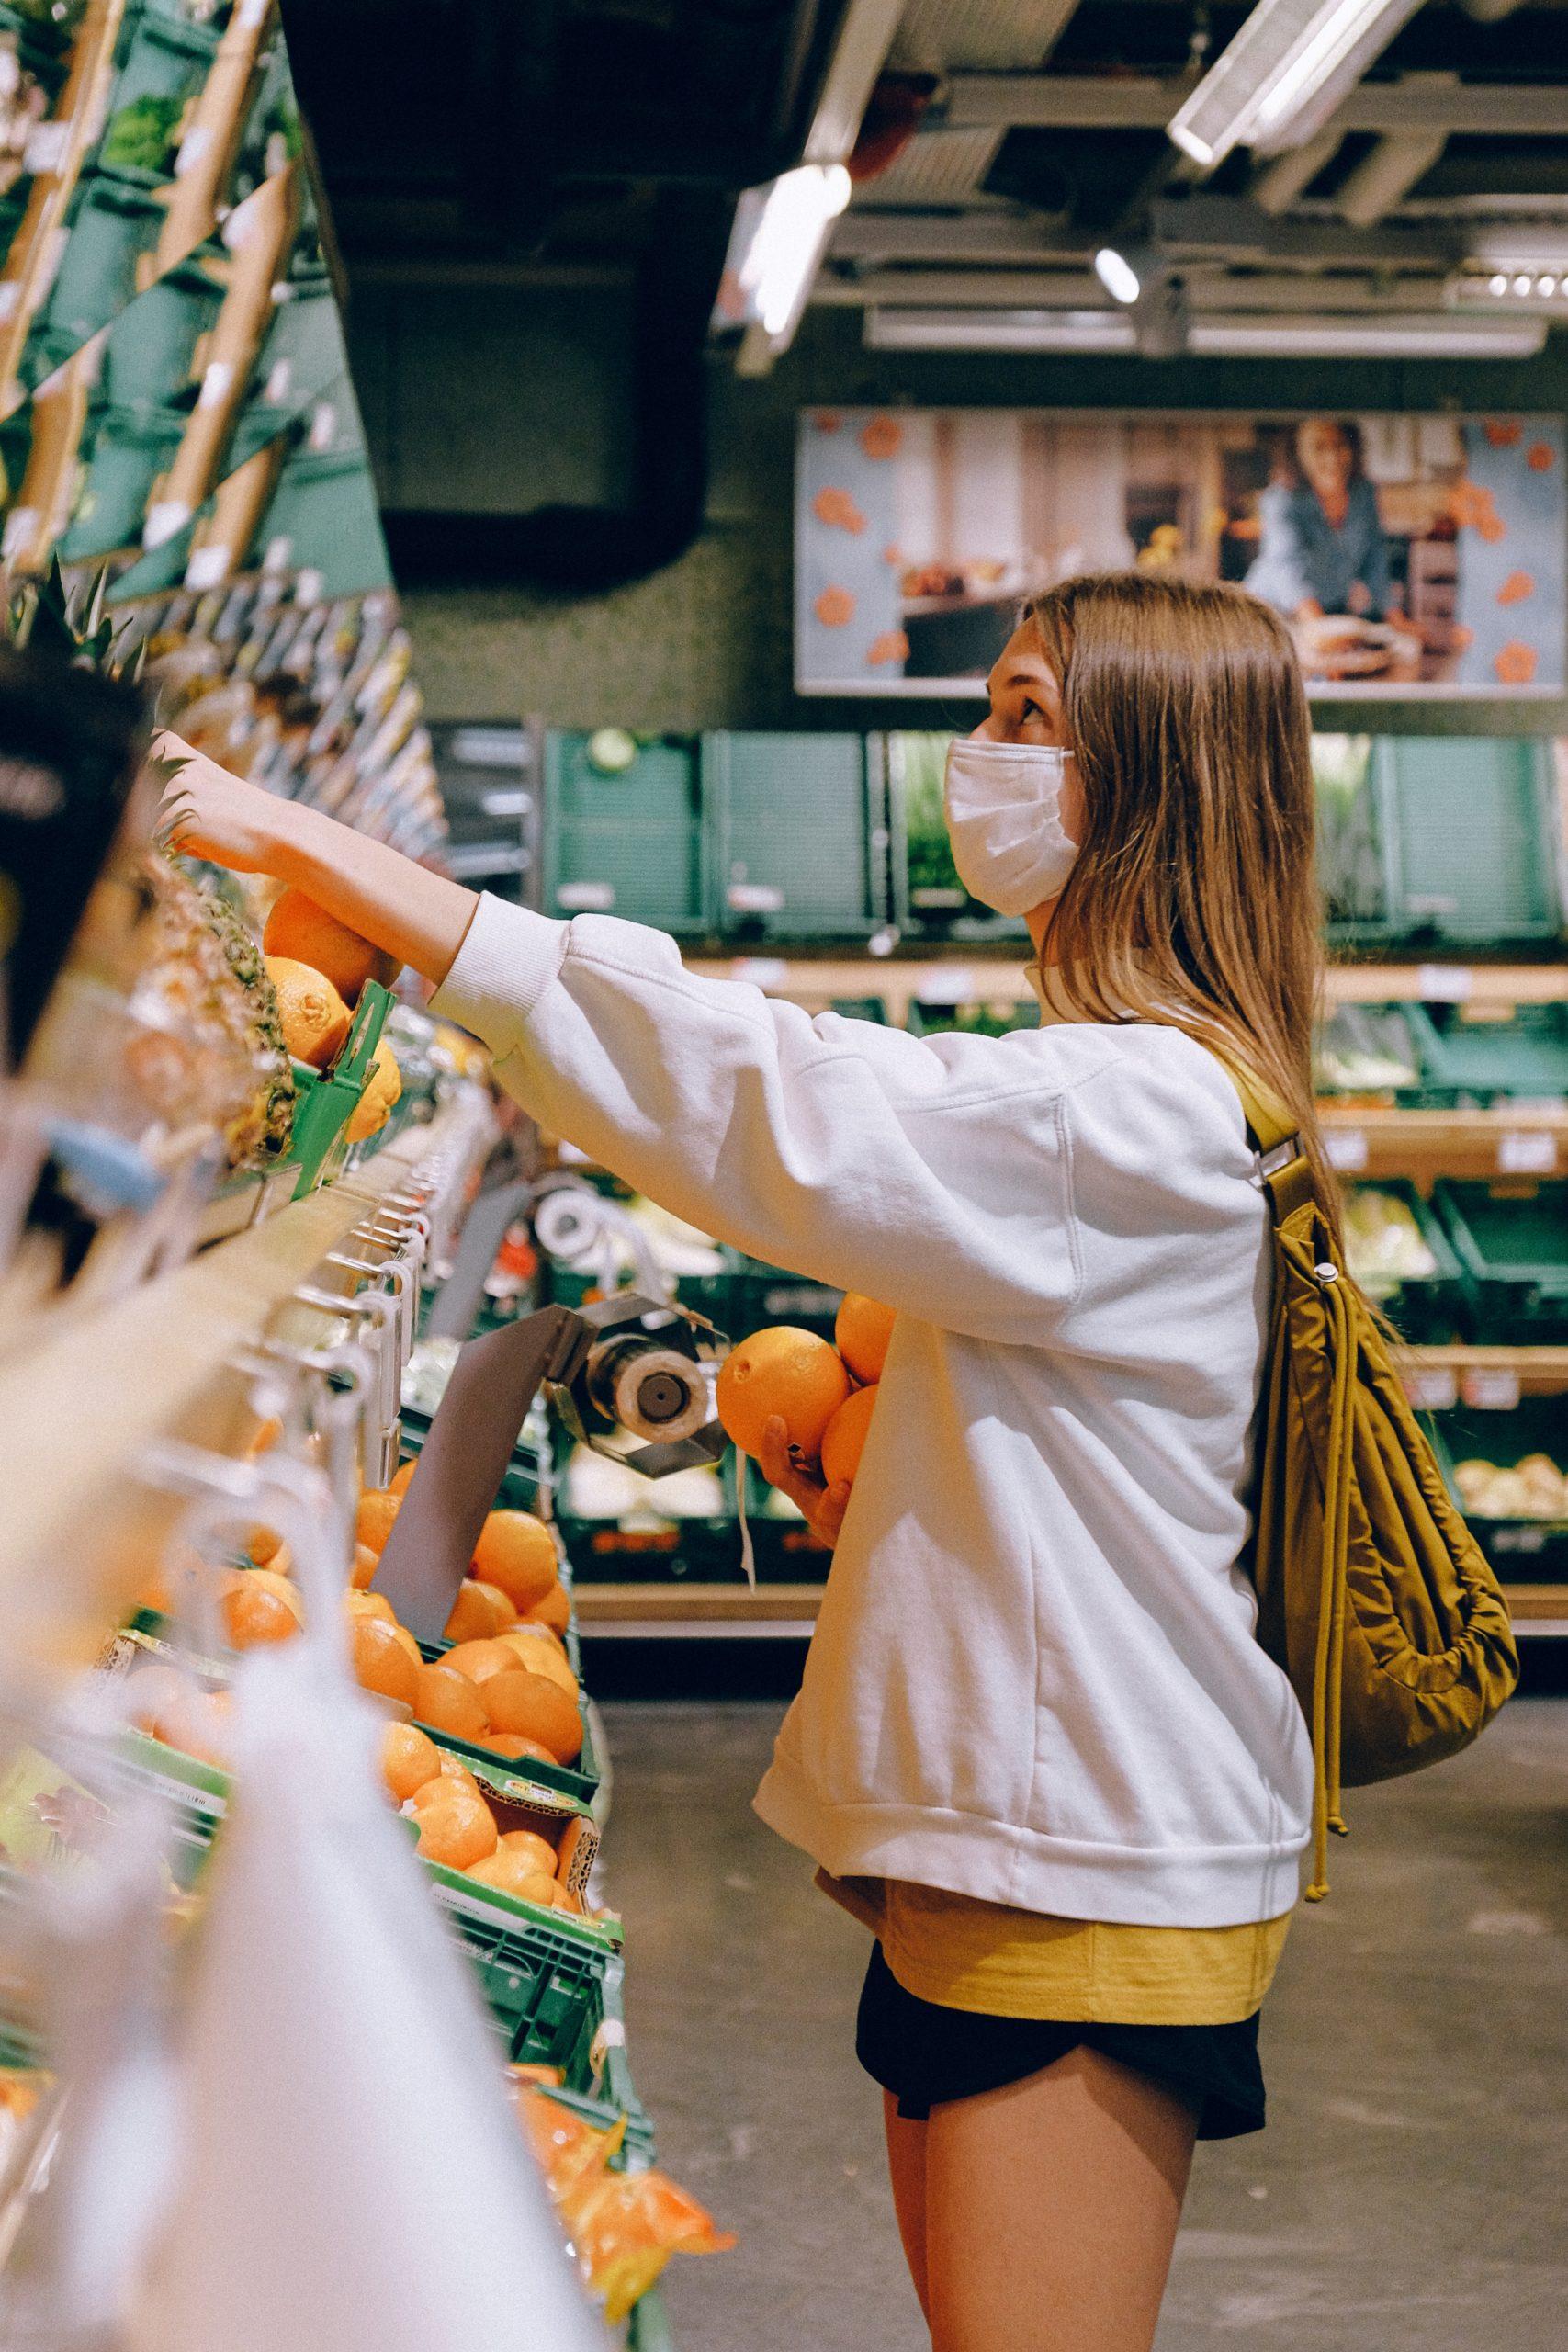 Person In Shop